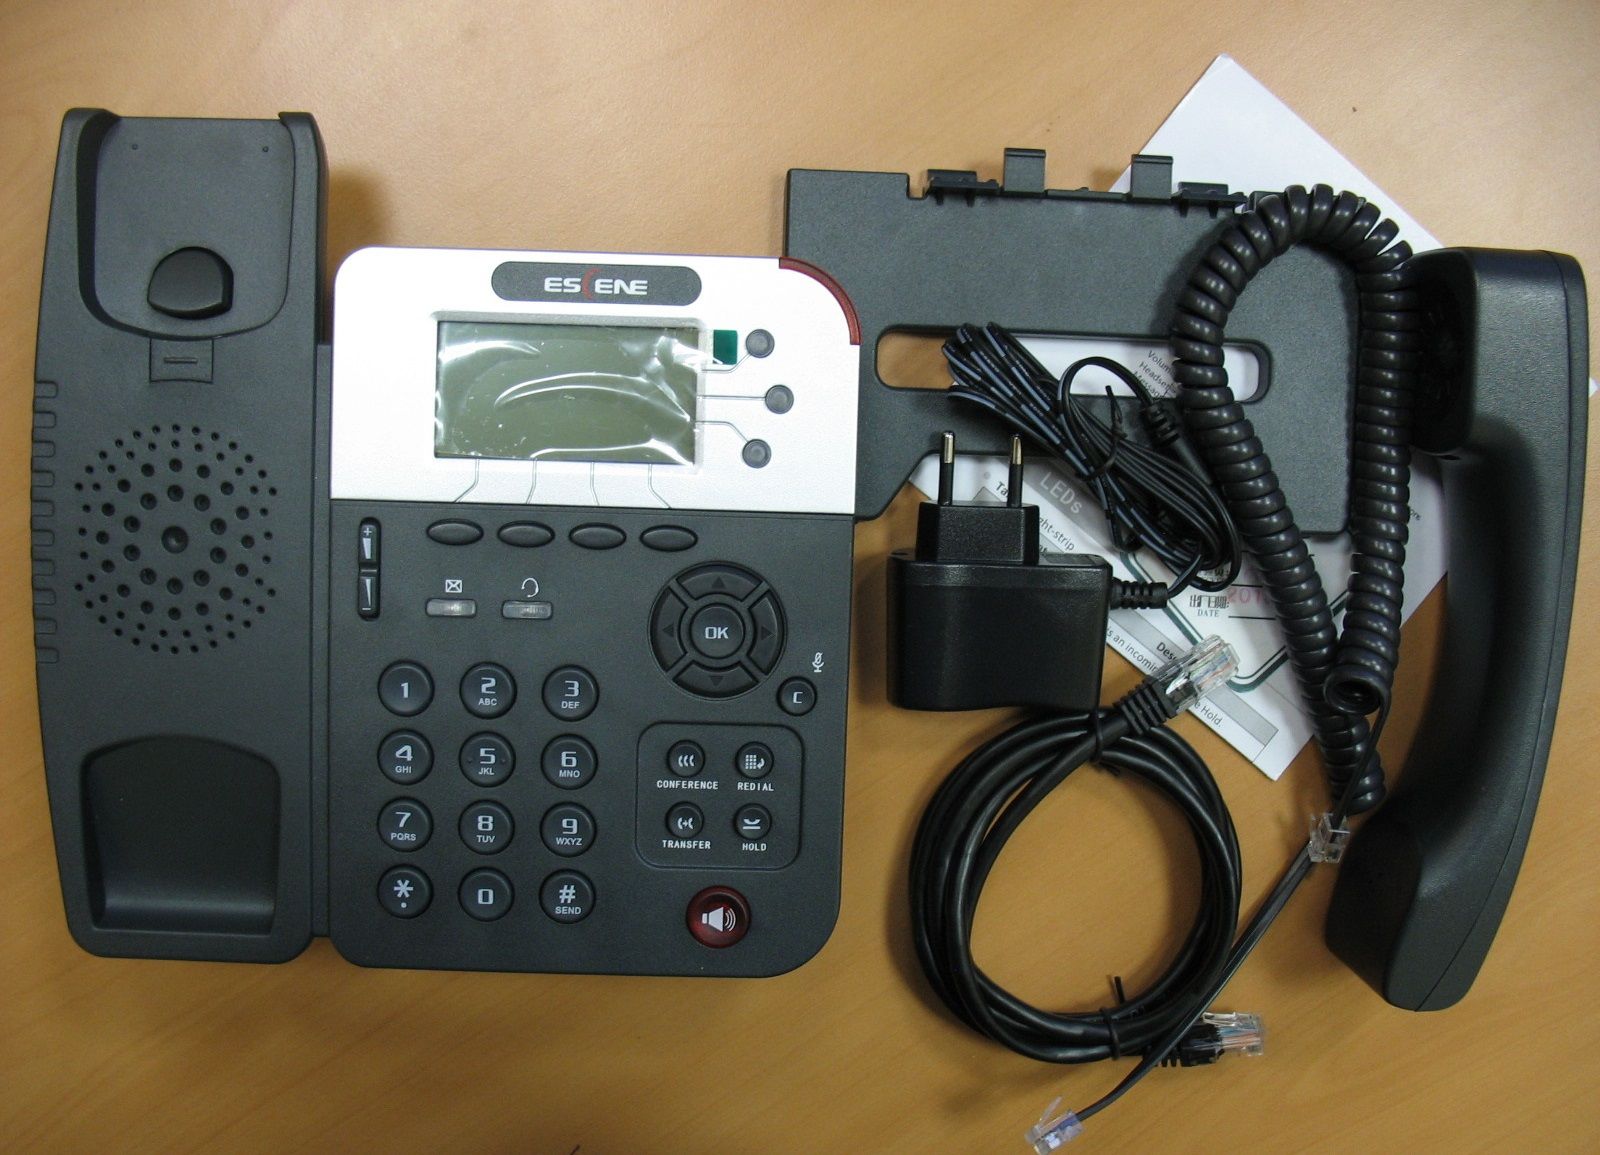 Комплект поставки телефона.